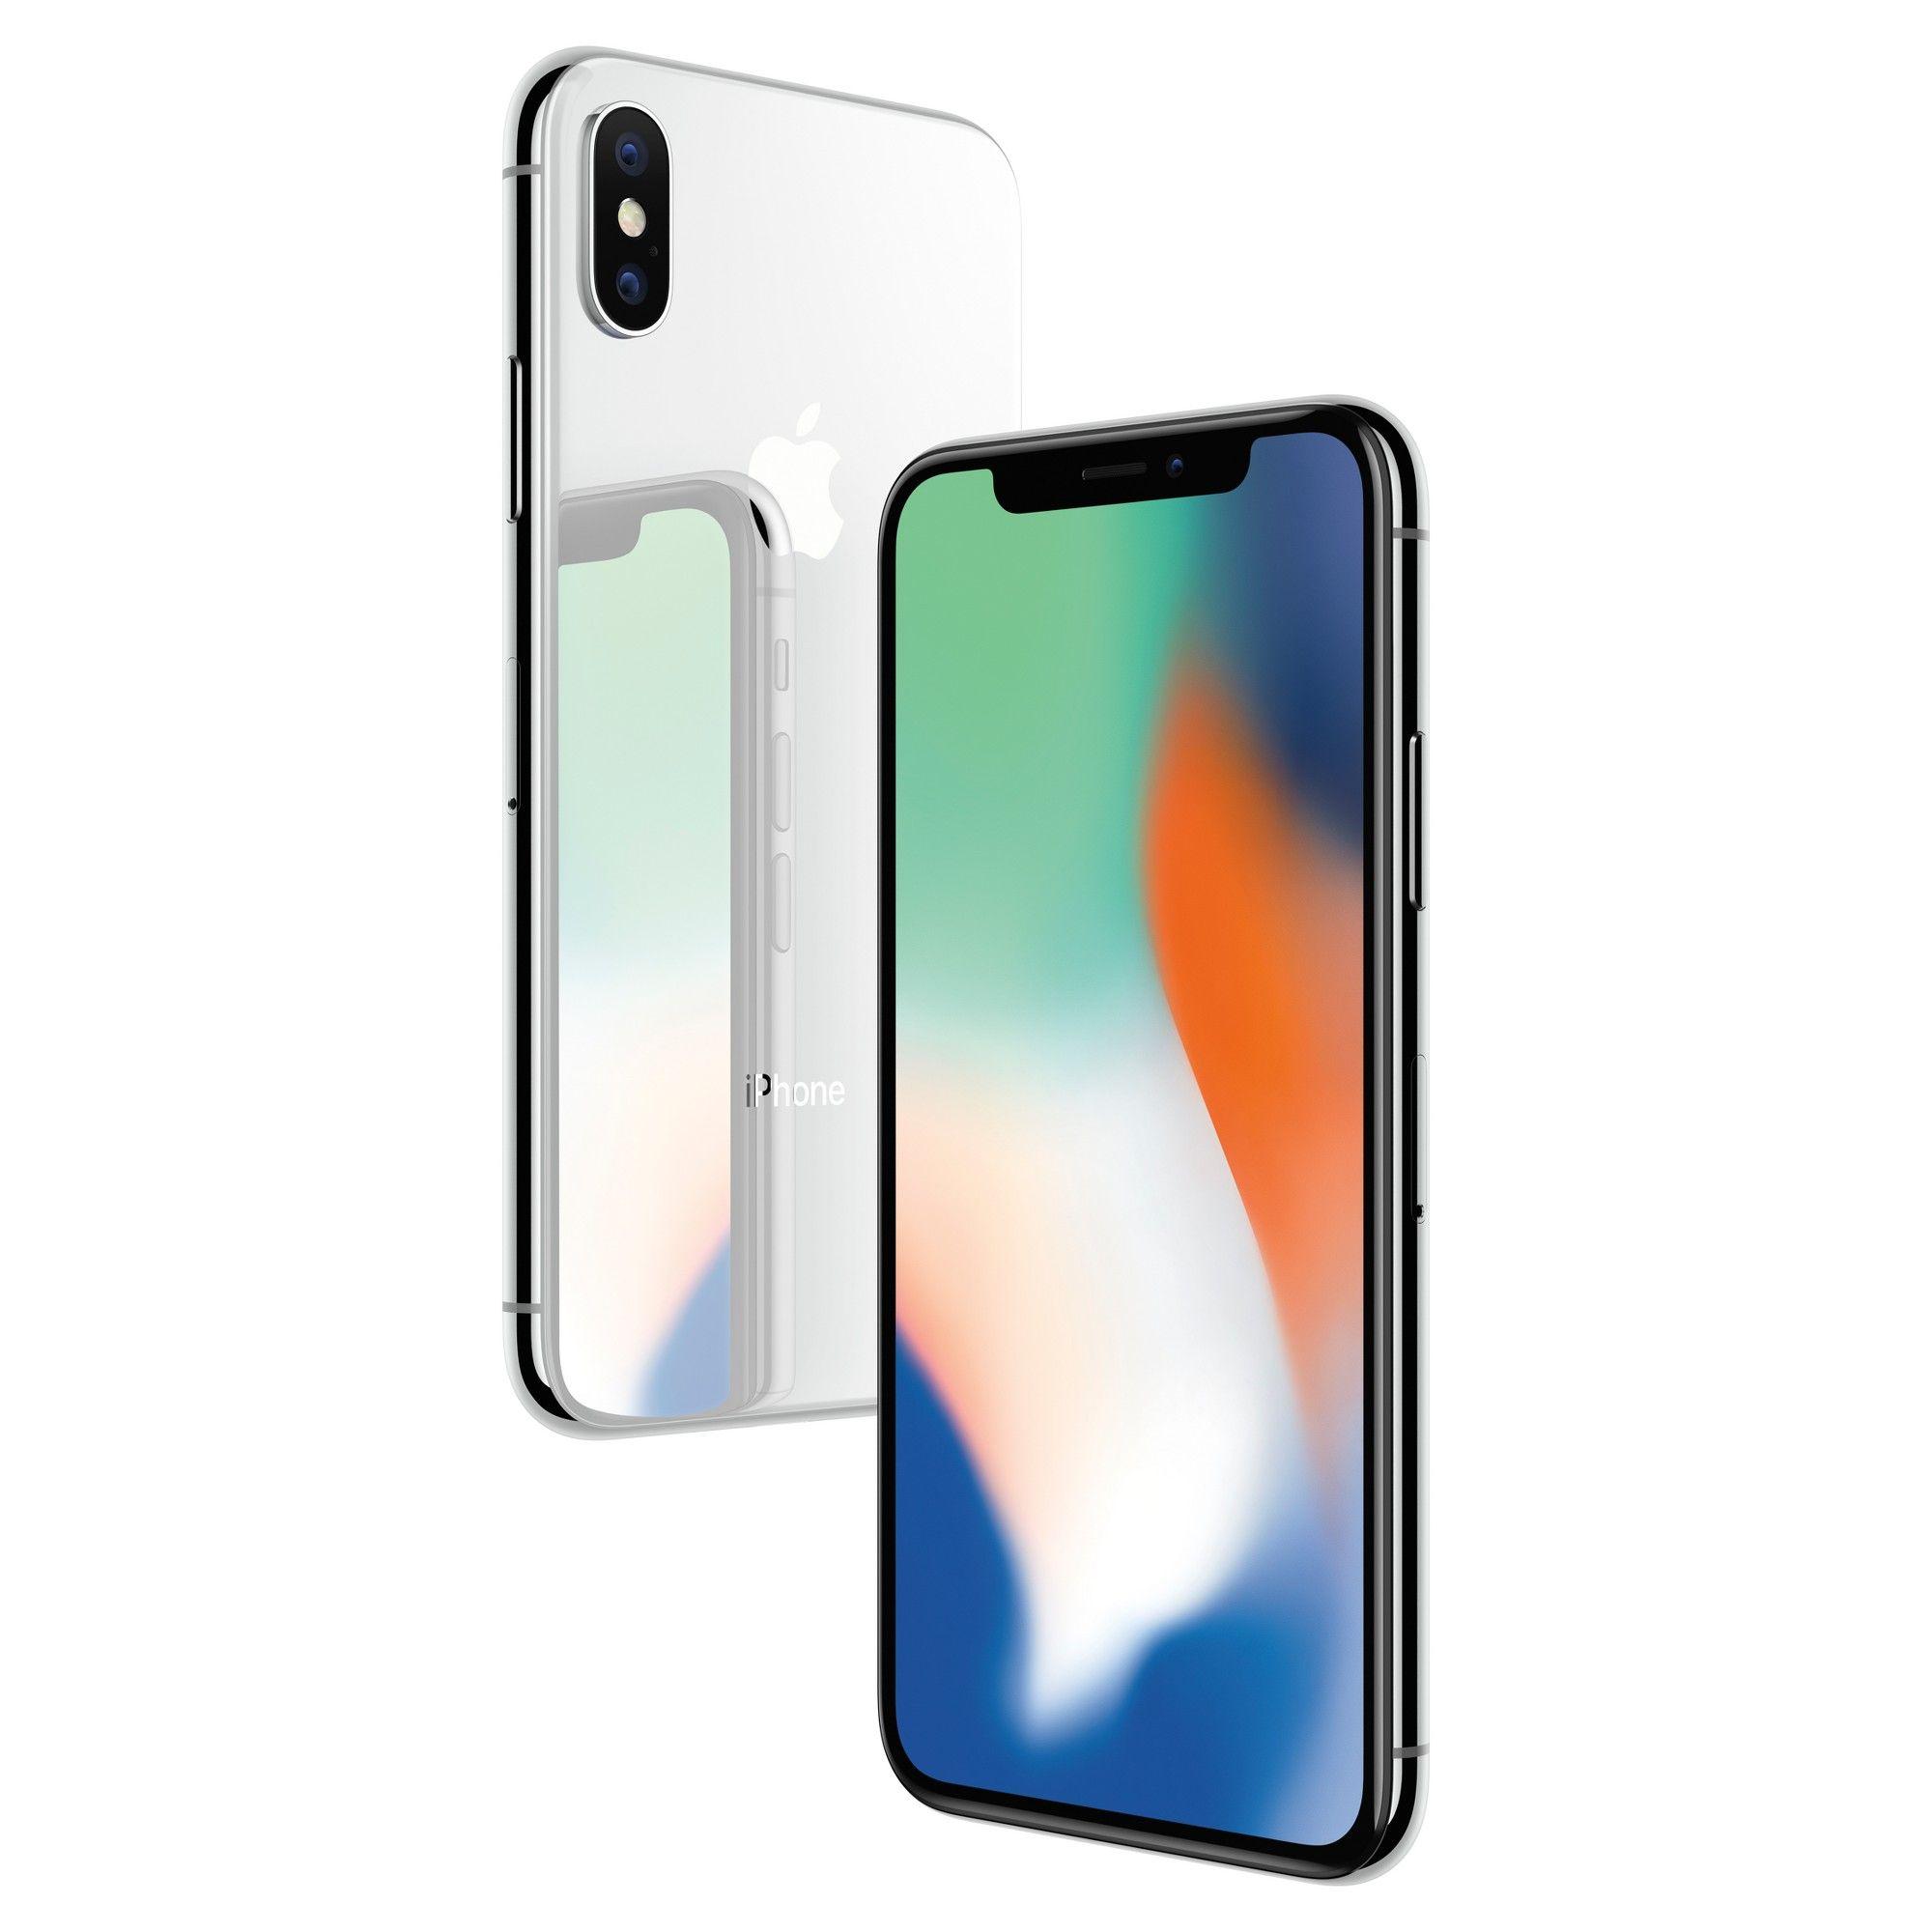 Apple Iphone X 64gb Silver Iphone Prepaid Phones Apple Iphone